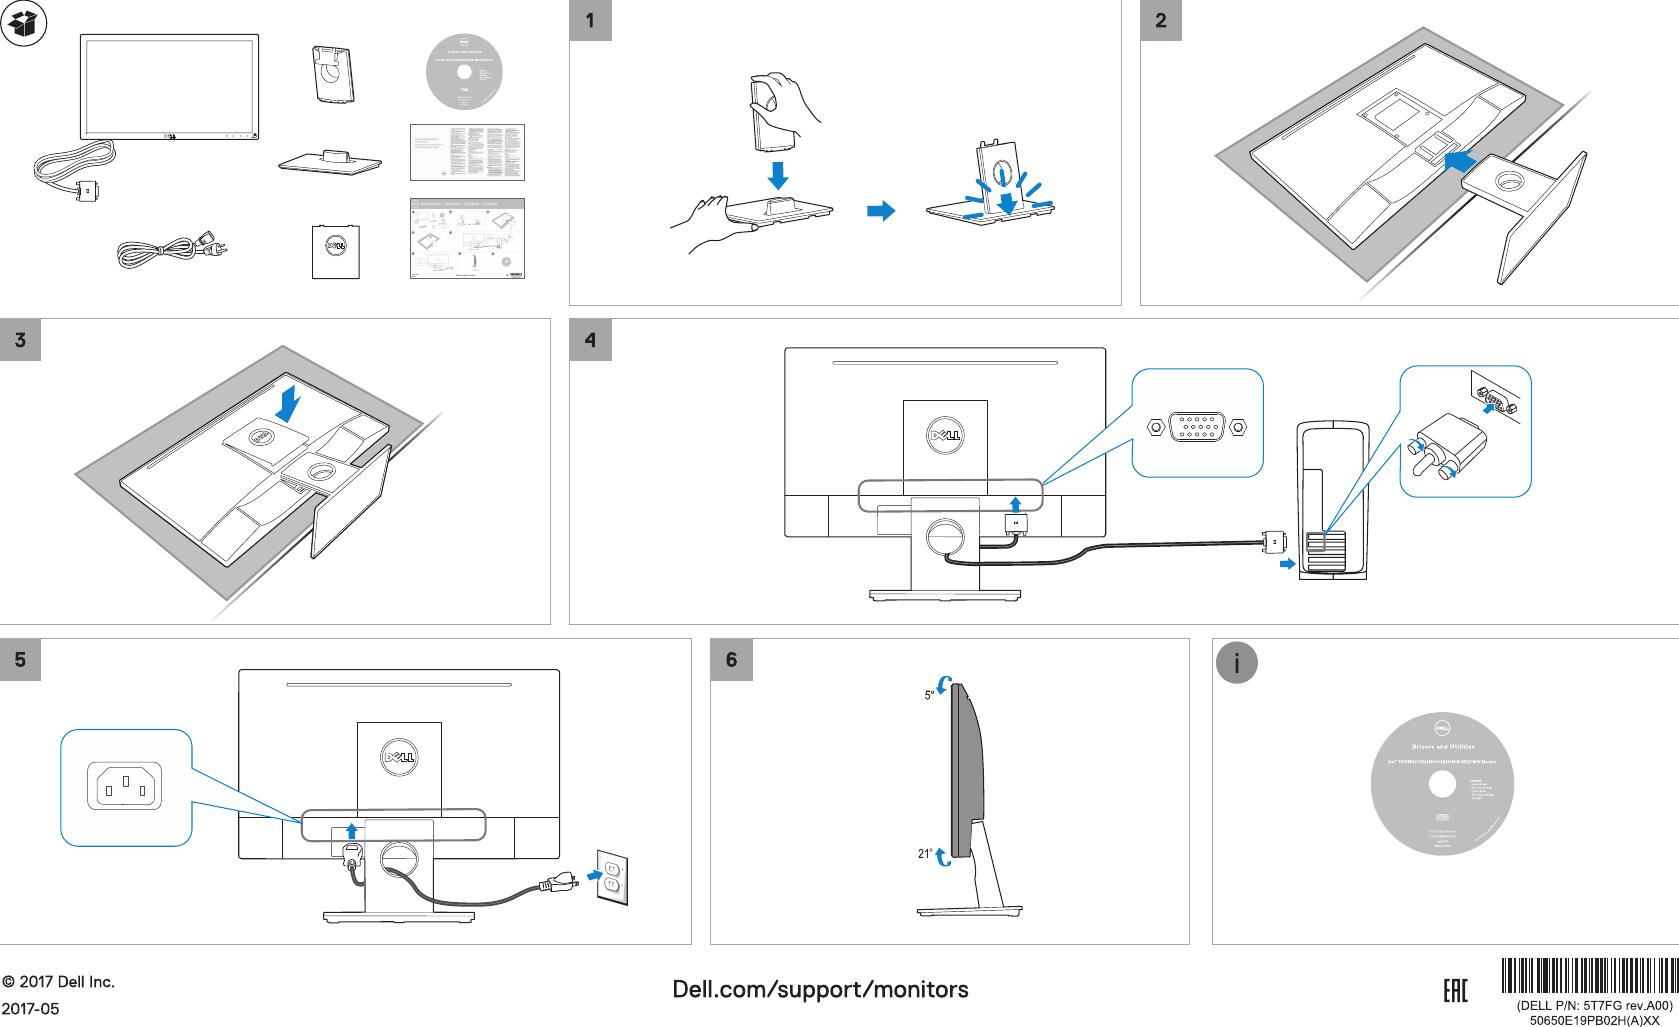 Dell Se Hv Monitor Stru Na Uvodni P Iru Ka User Manual Dal A Dokumenty Strua Na Aovodna